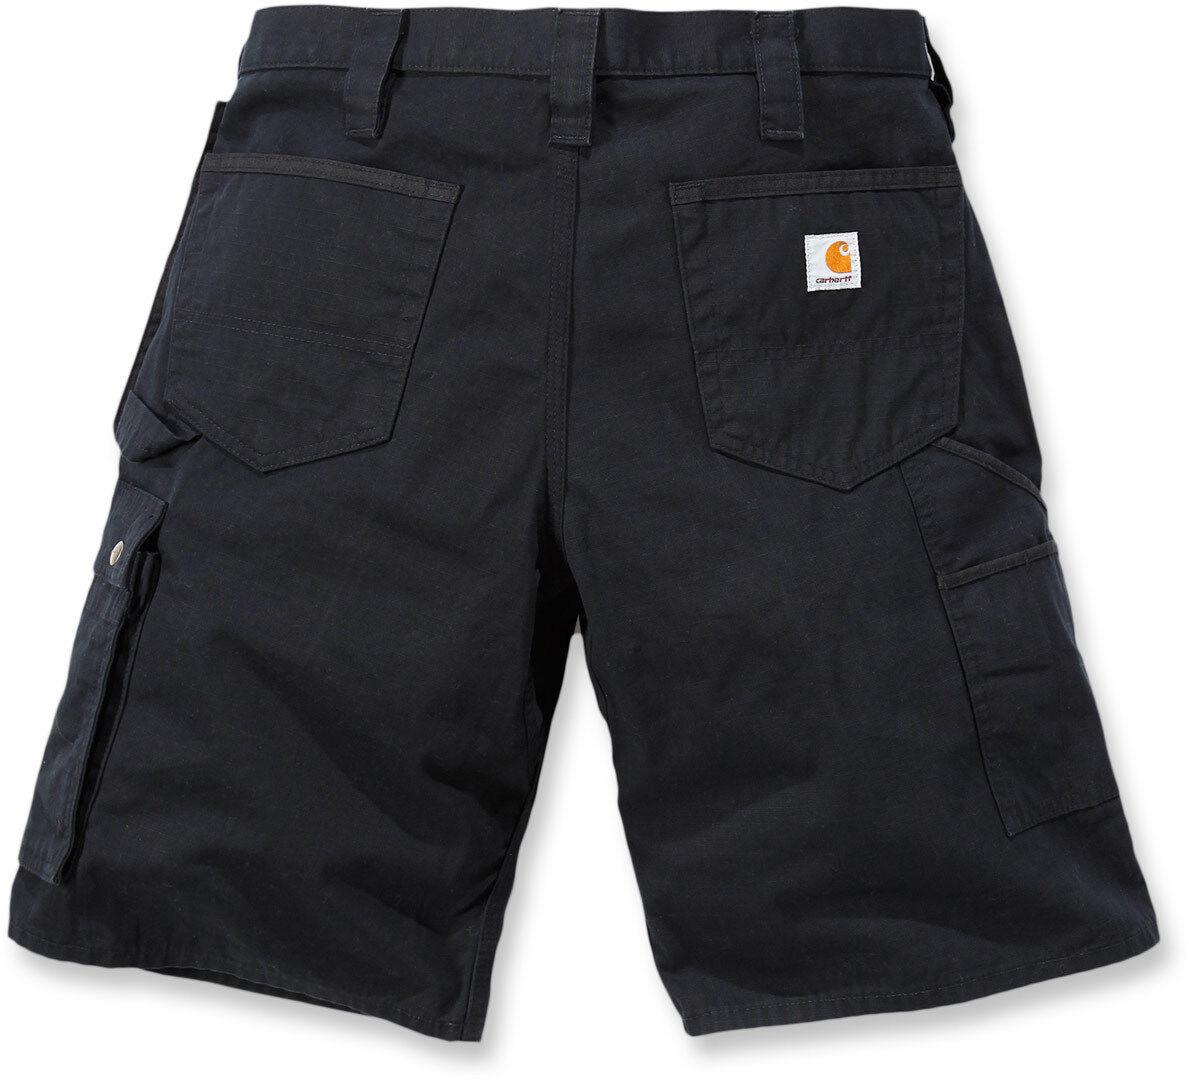 Carhartt Multi Pocket Ripstop Pantalones cortos Negro 38